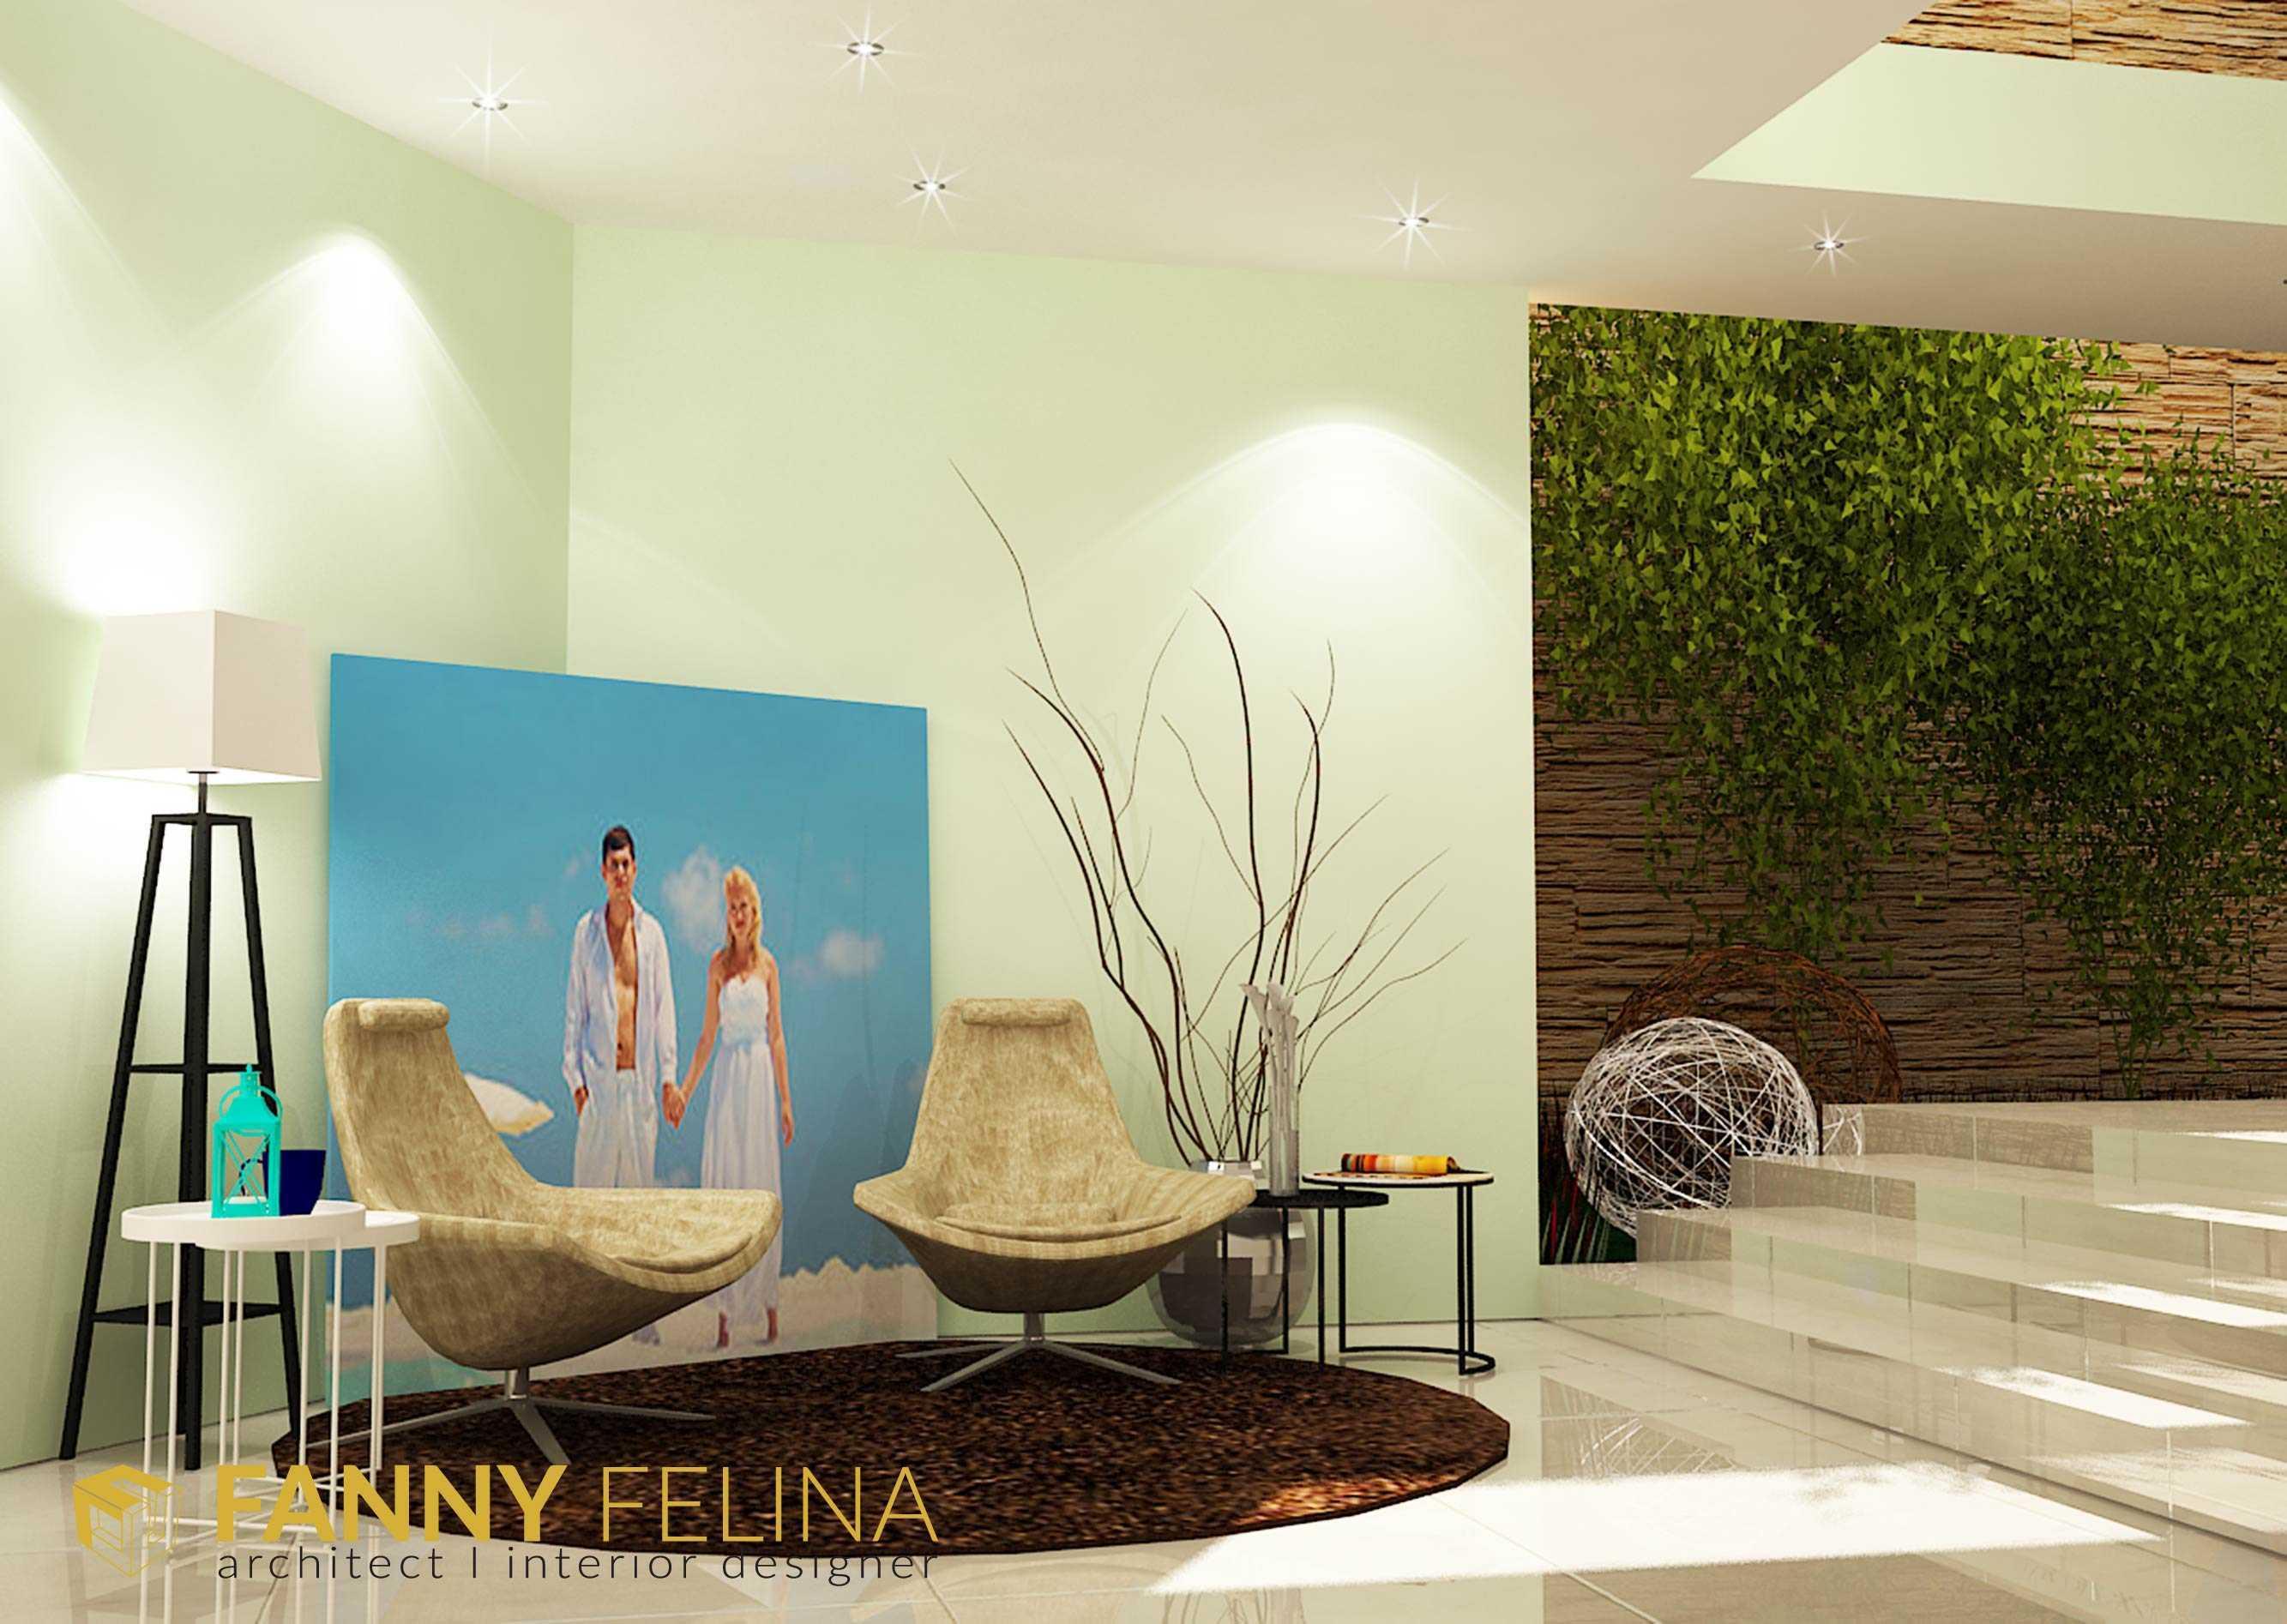 Fanny Felina Architecture & Interior Design Hercules House Surabaya, Surabaya City, East Java, Indonesia Surabaya, Surabaya City, East Java, Indonesia 05 Modern  34578